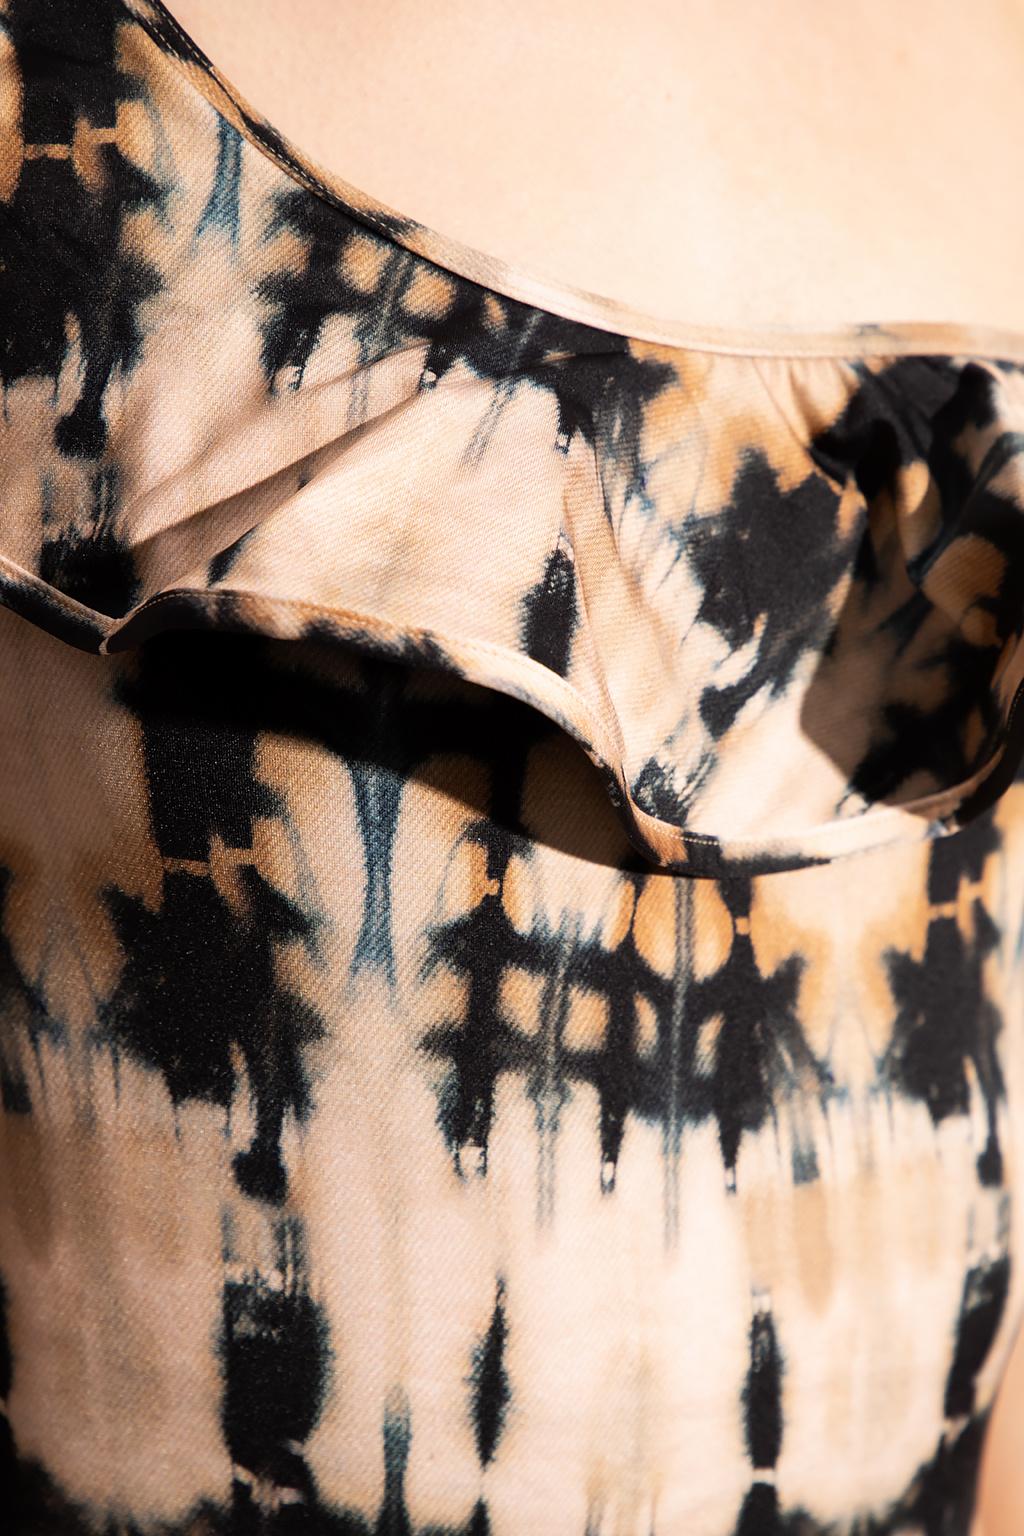 Ulla Johnson 'Martina' one-piece swimsuit